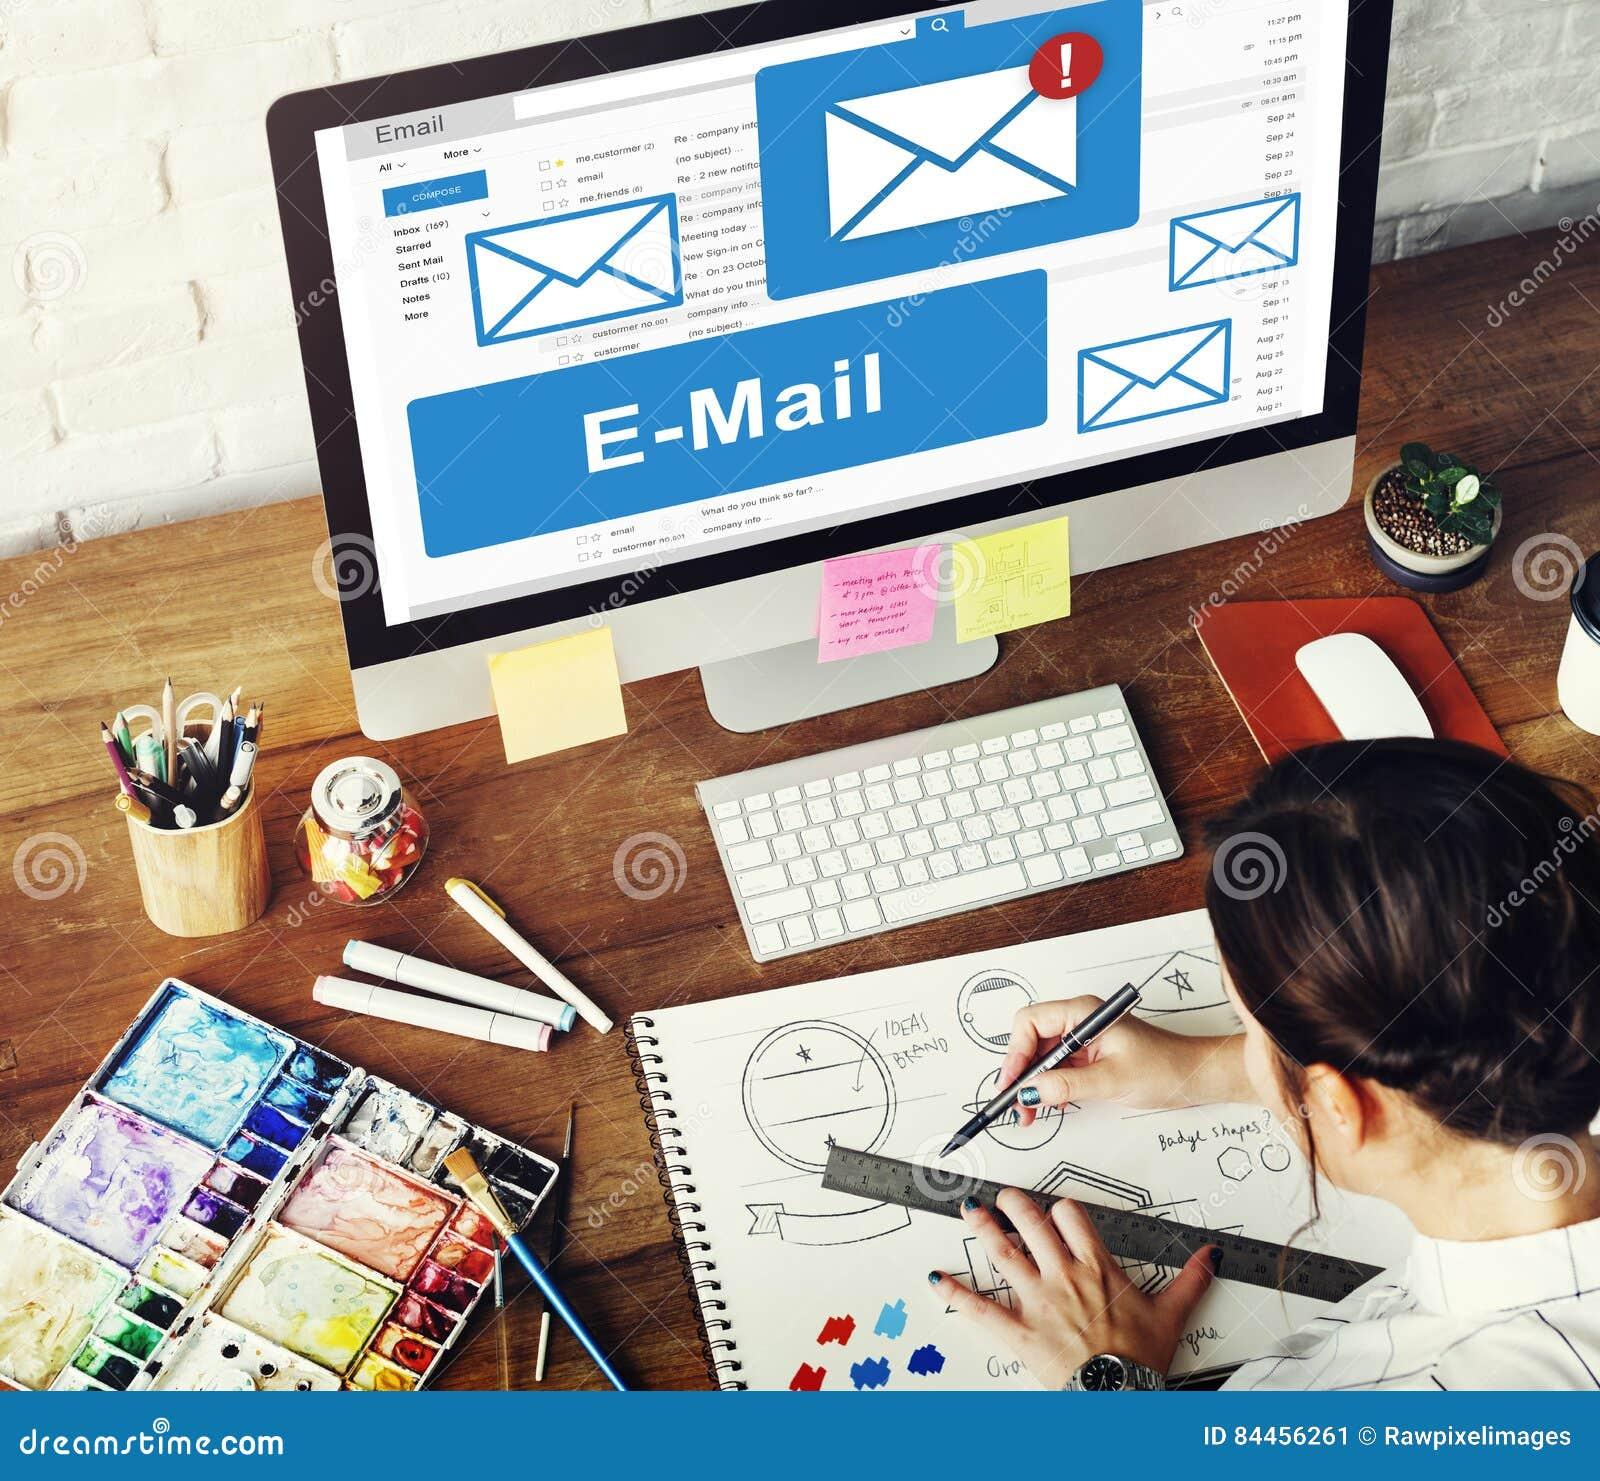 E-Mail-Korrespondenz-Kommunikationstechnologie-Konzept